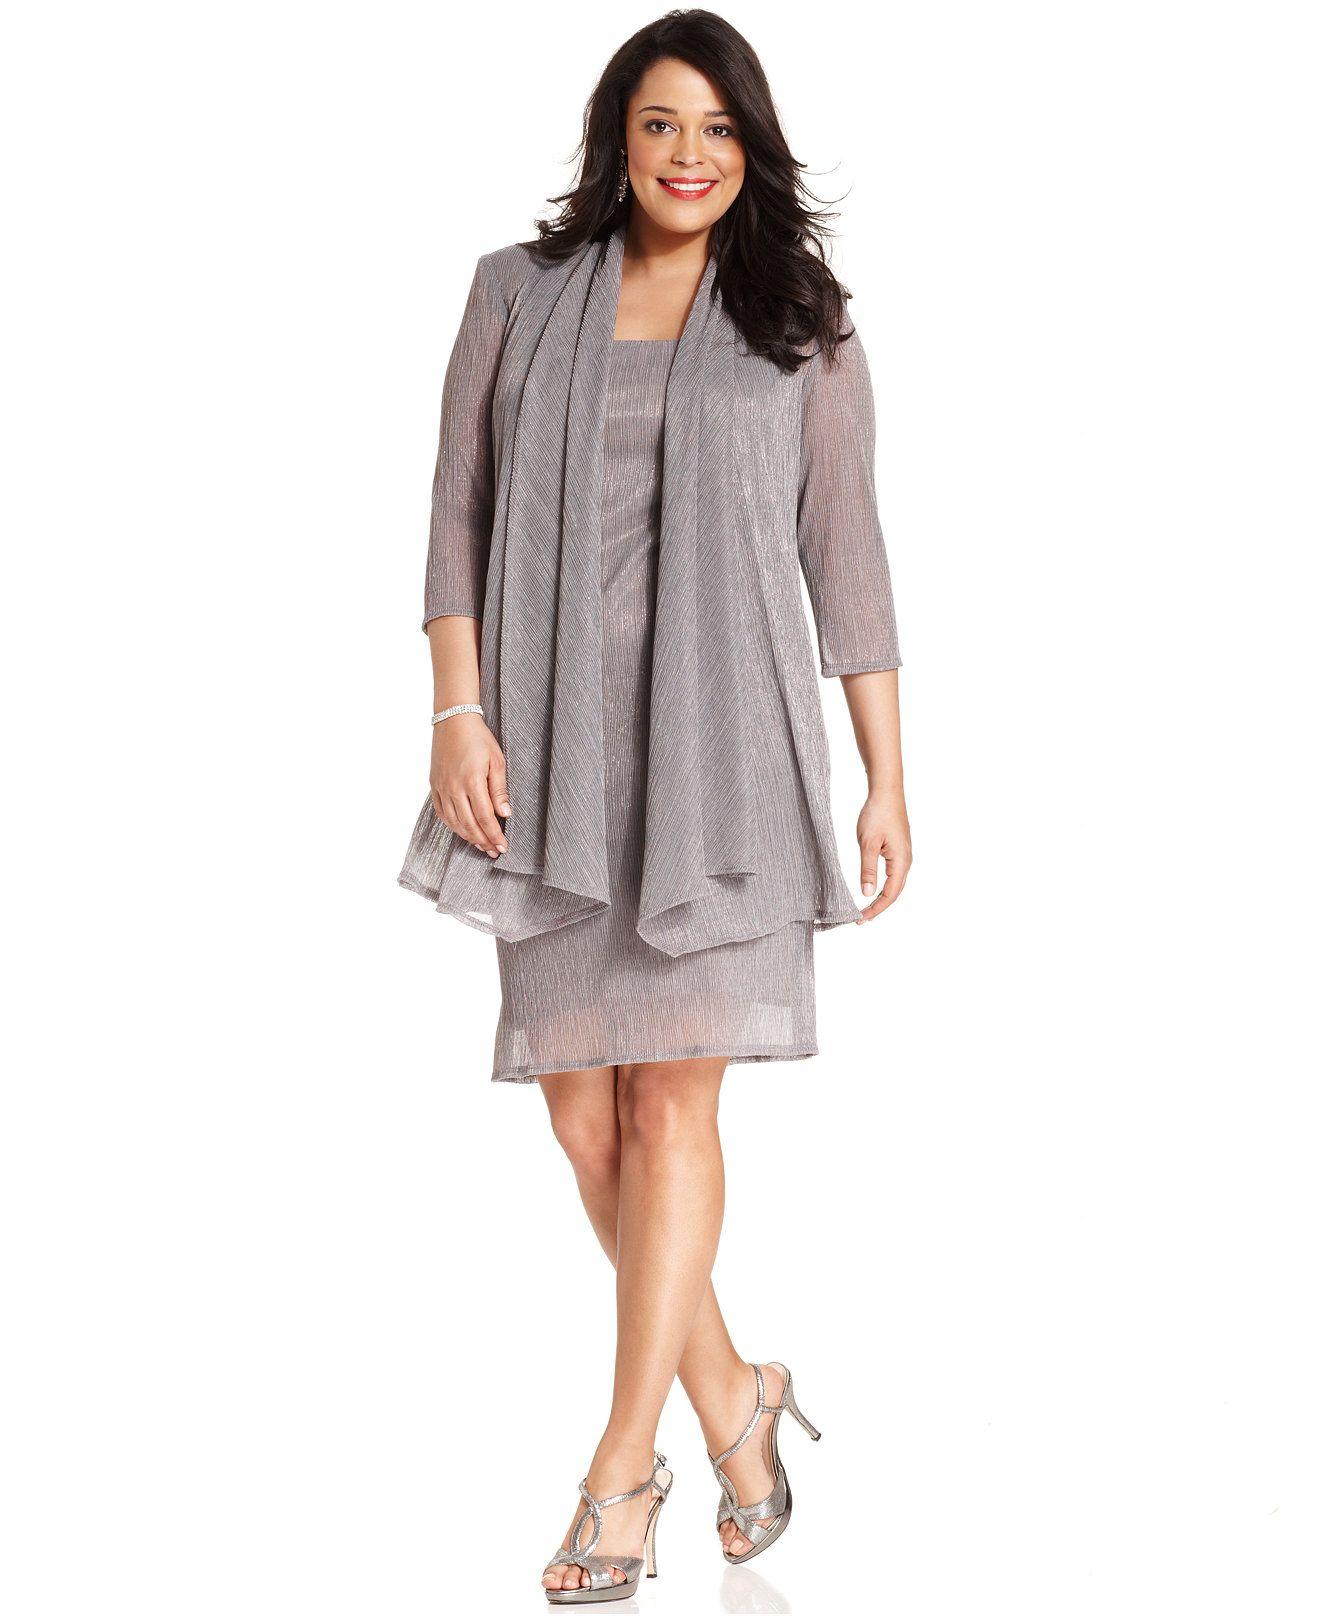 Rm Richards Plus Size Sleeveless Metallic Dress And Jacket Mother